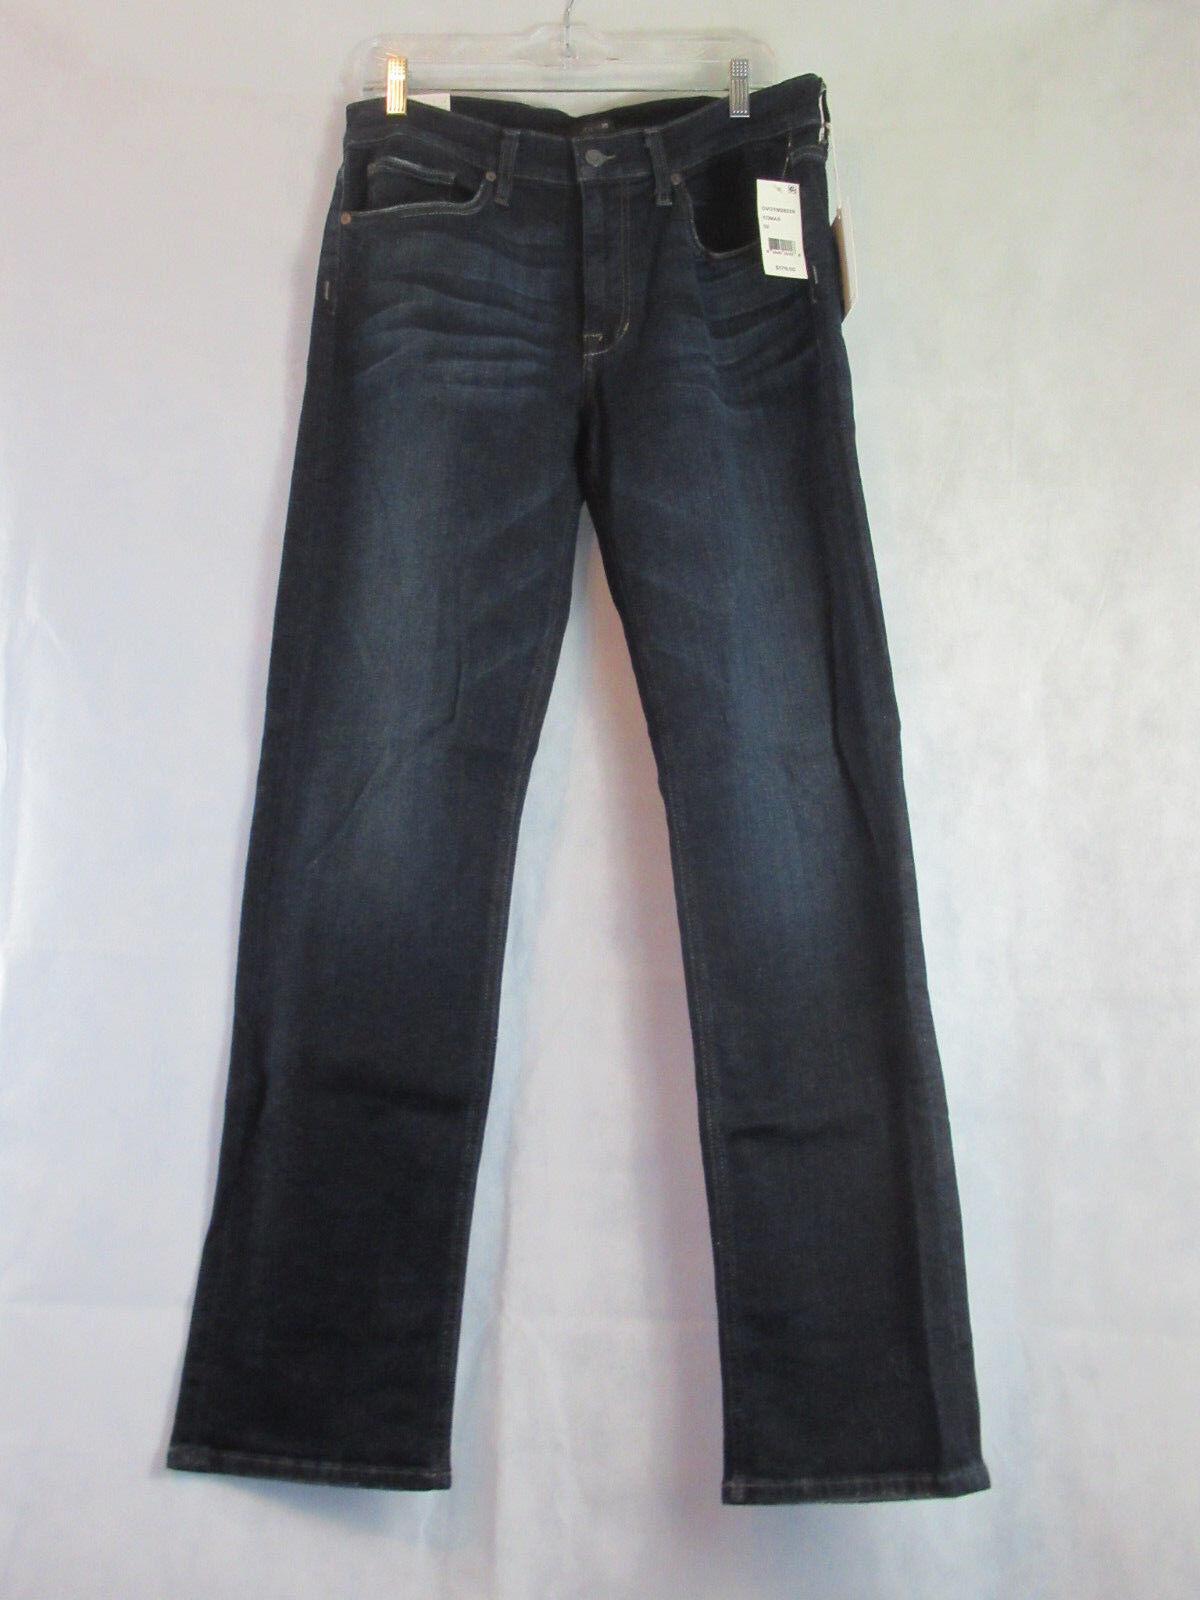 Joe's Jeans Men's Classic Fit Straight Leg Jeans, Thomas bluee Wash, 32x33